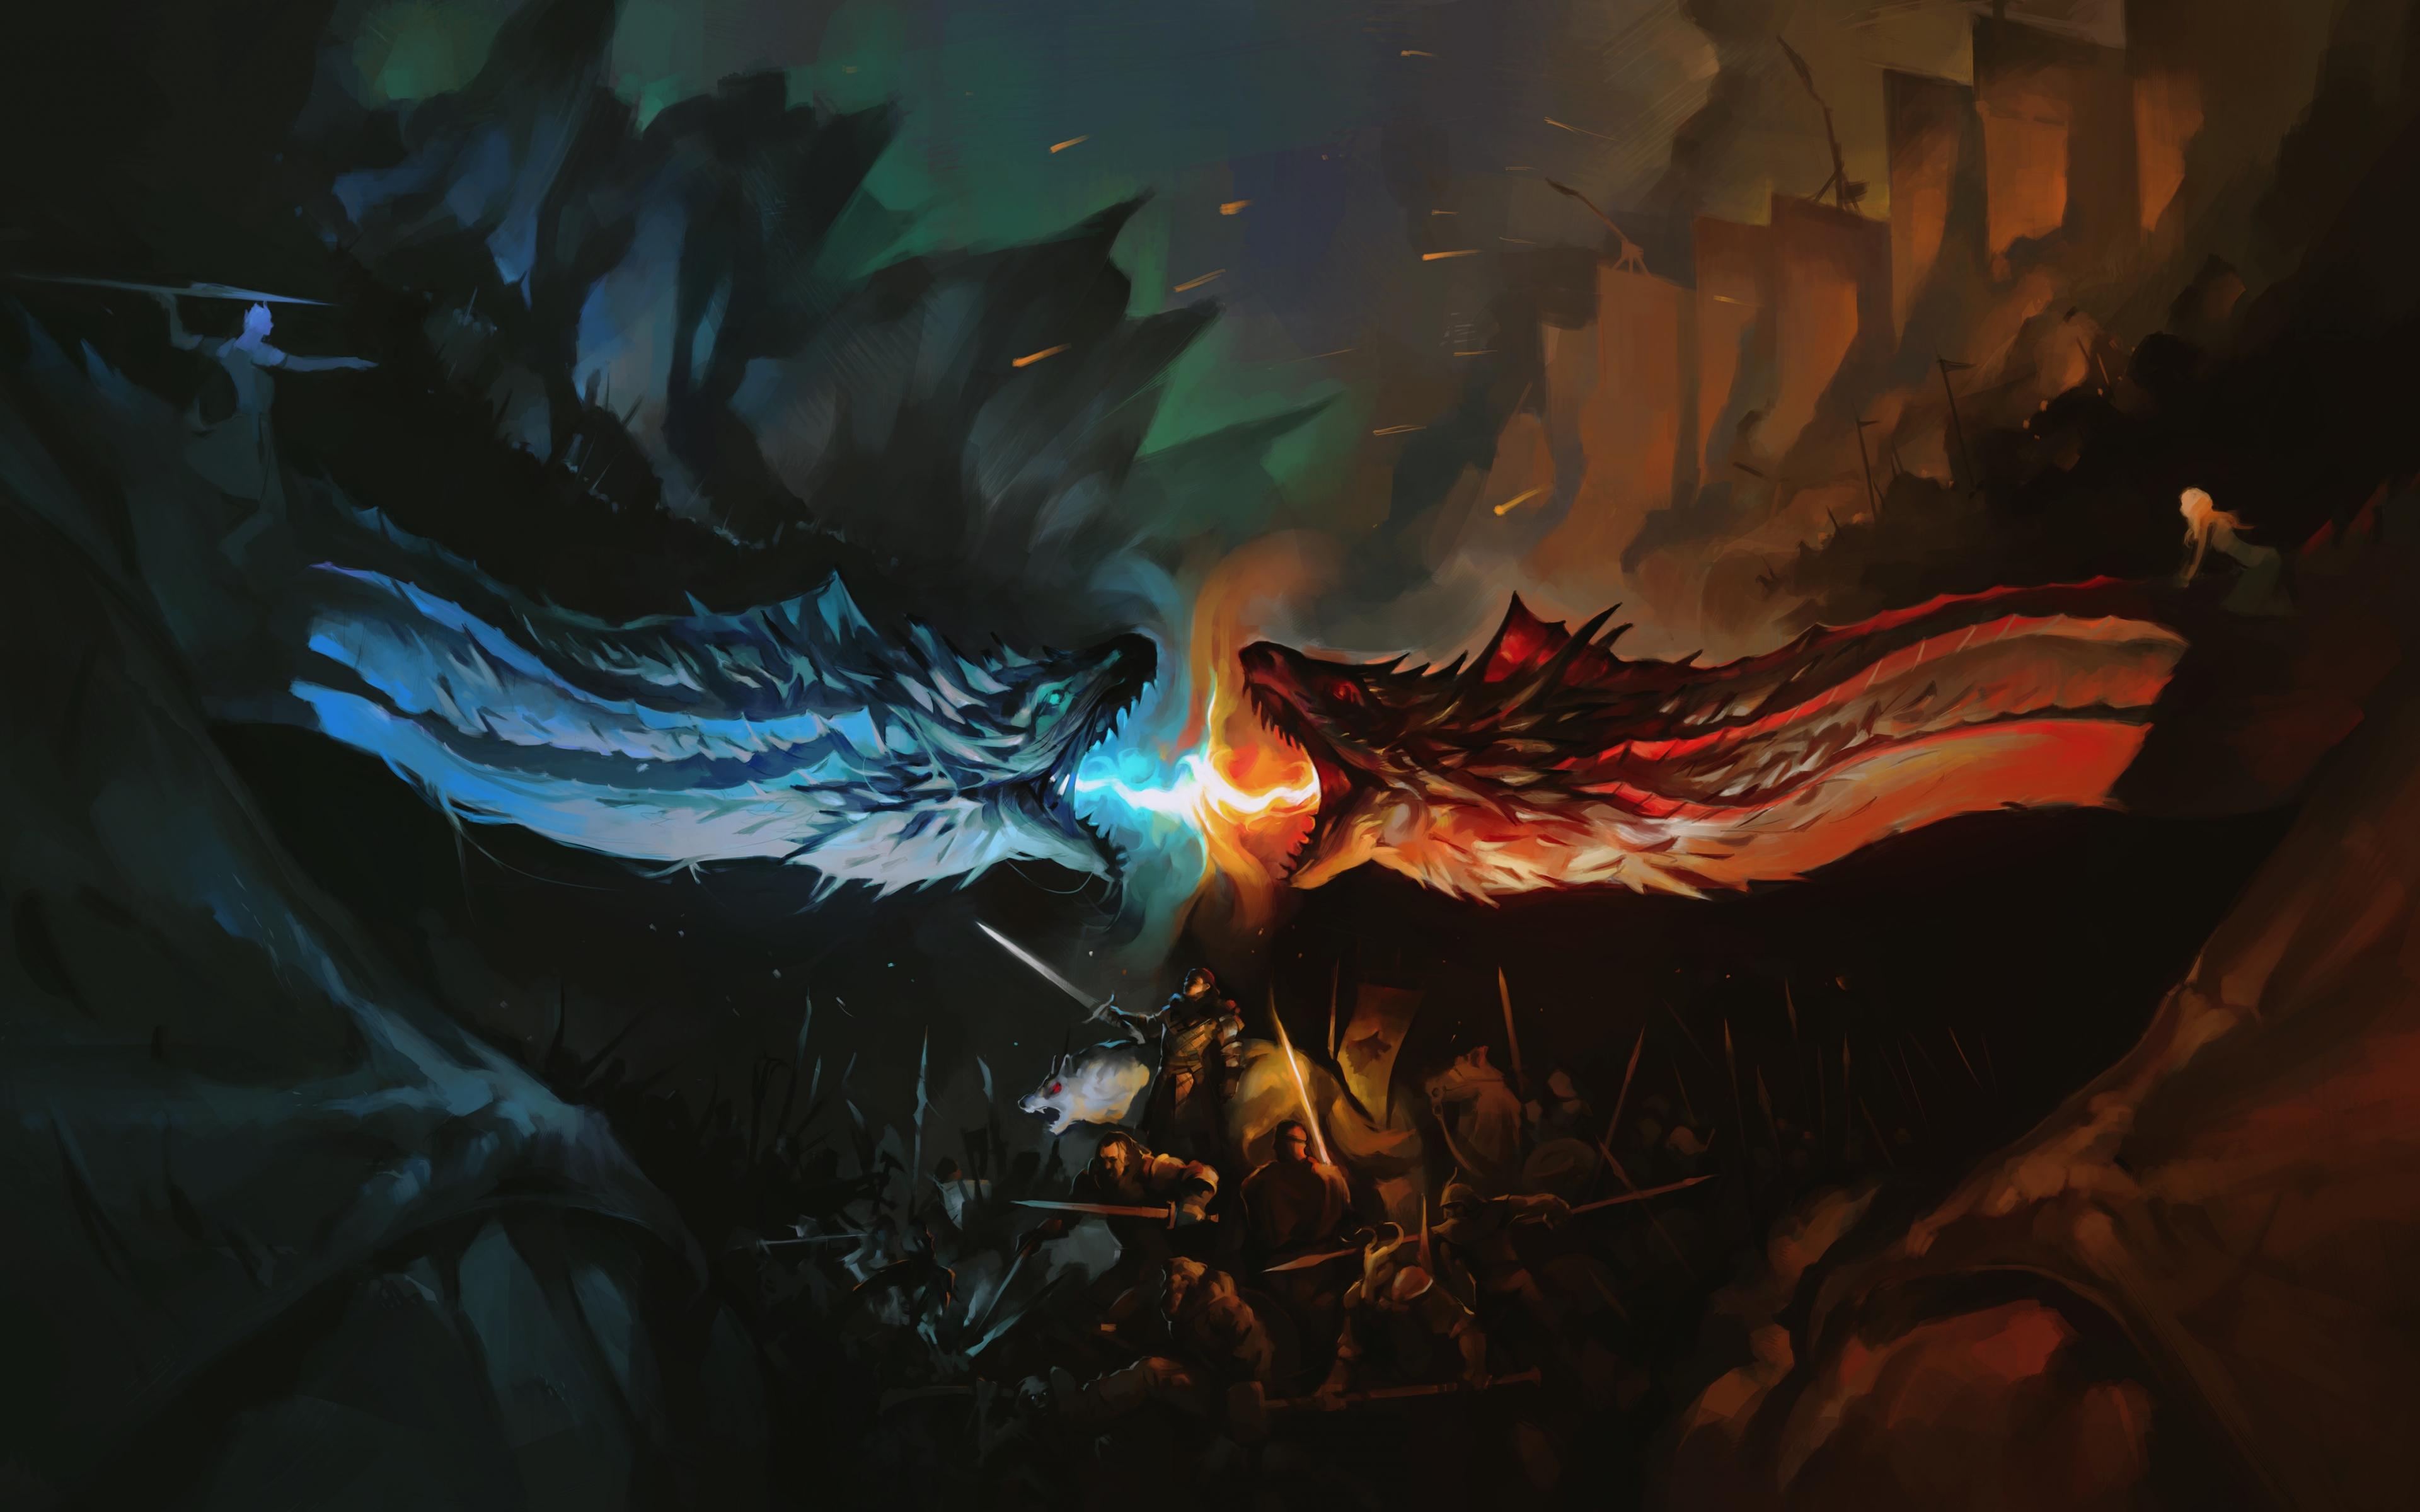 4k Game Of Thrones Wallpaper: Download 3840x2400 Wallpaper Game Of Thrones, Tv Series